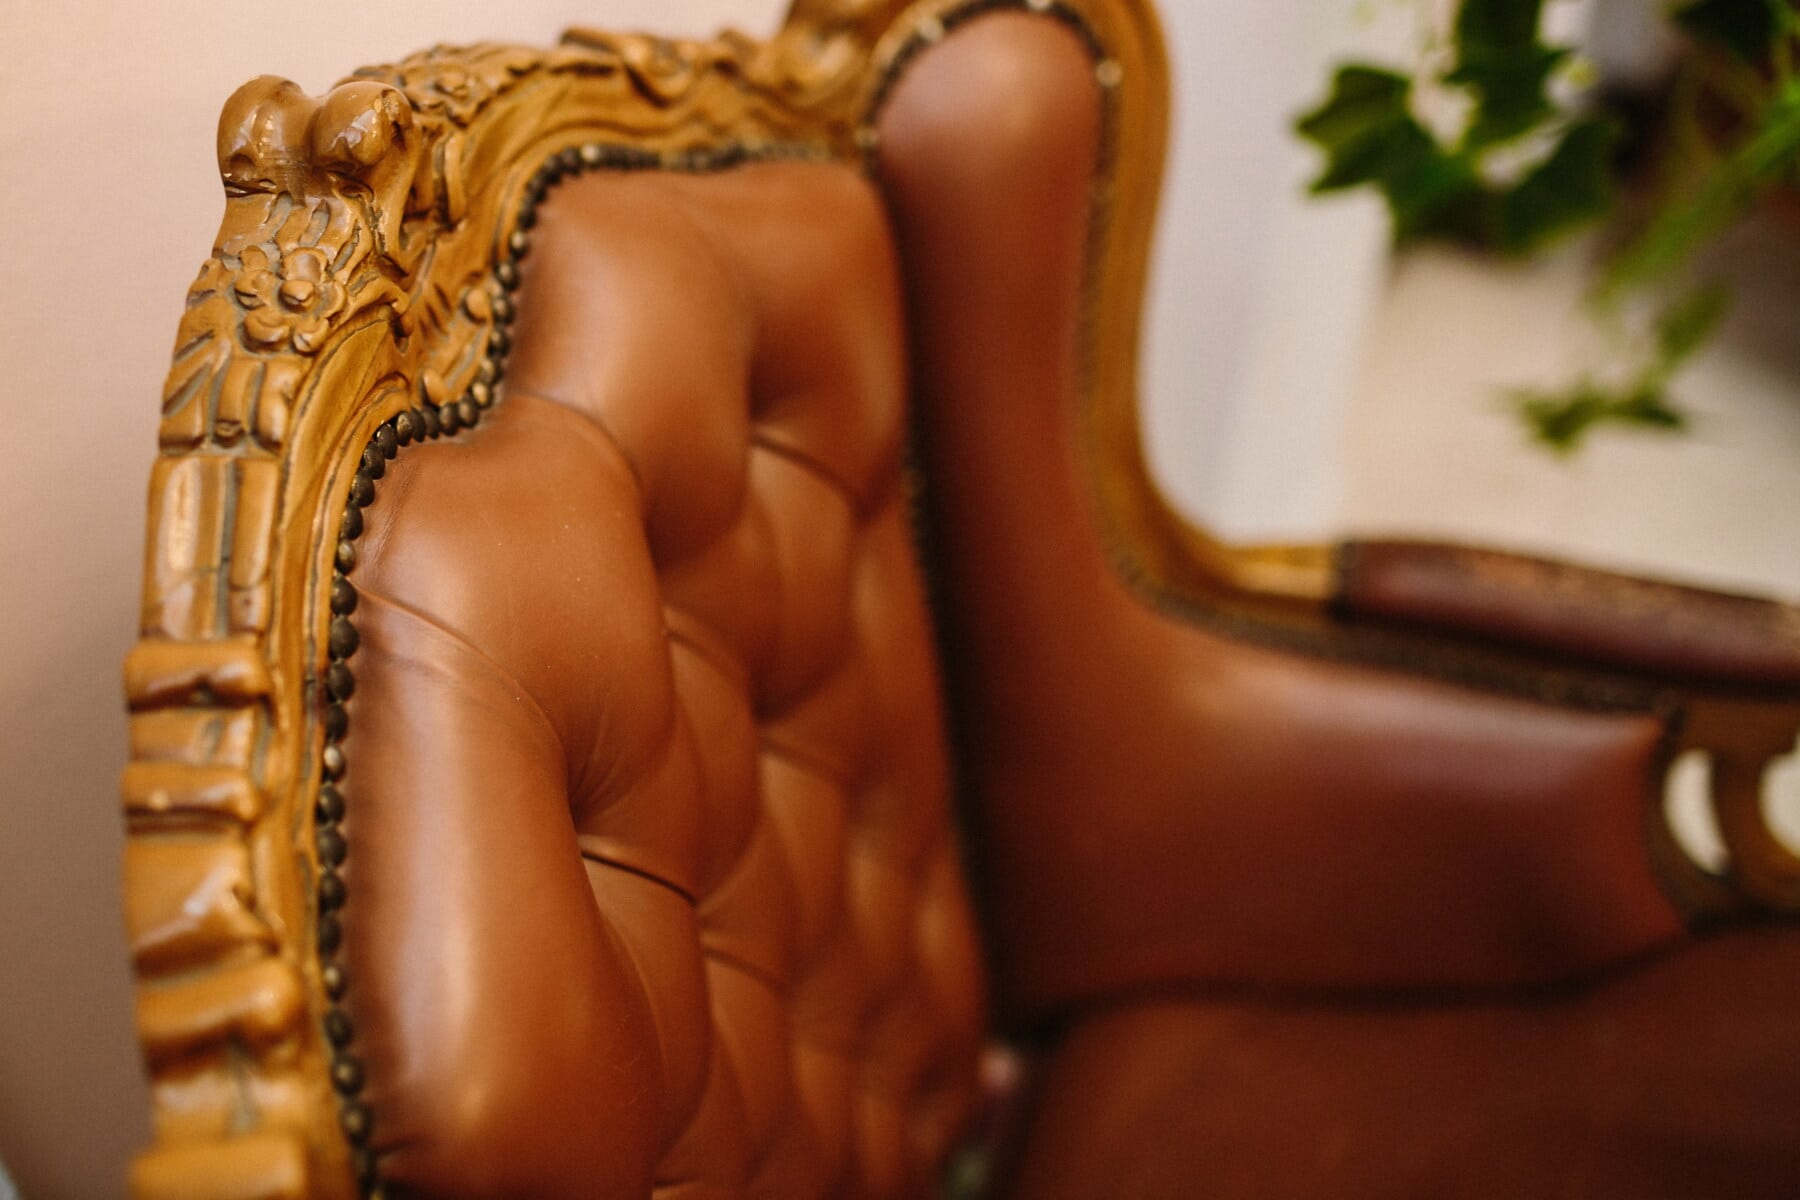 Luxus, Sessel, Antike, Leder, Schnitzereien, Tischlerei, Barock, handgefertigte, Mode, Frau